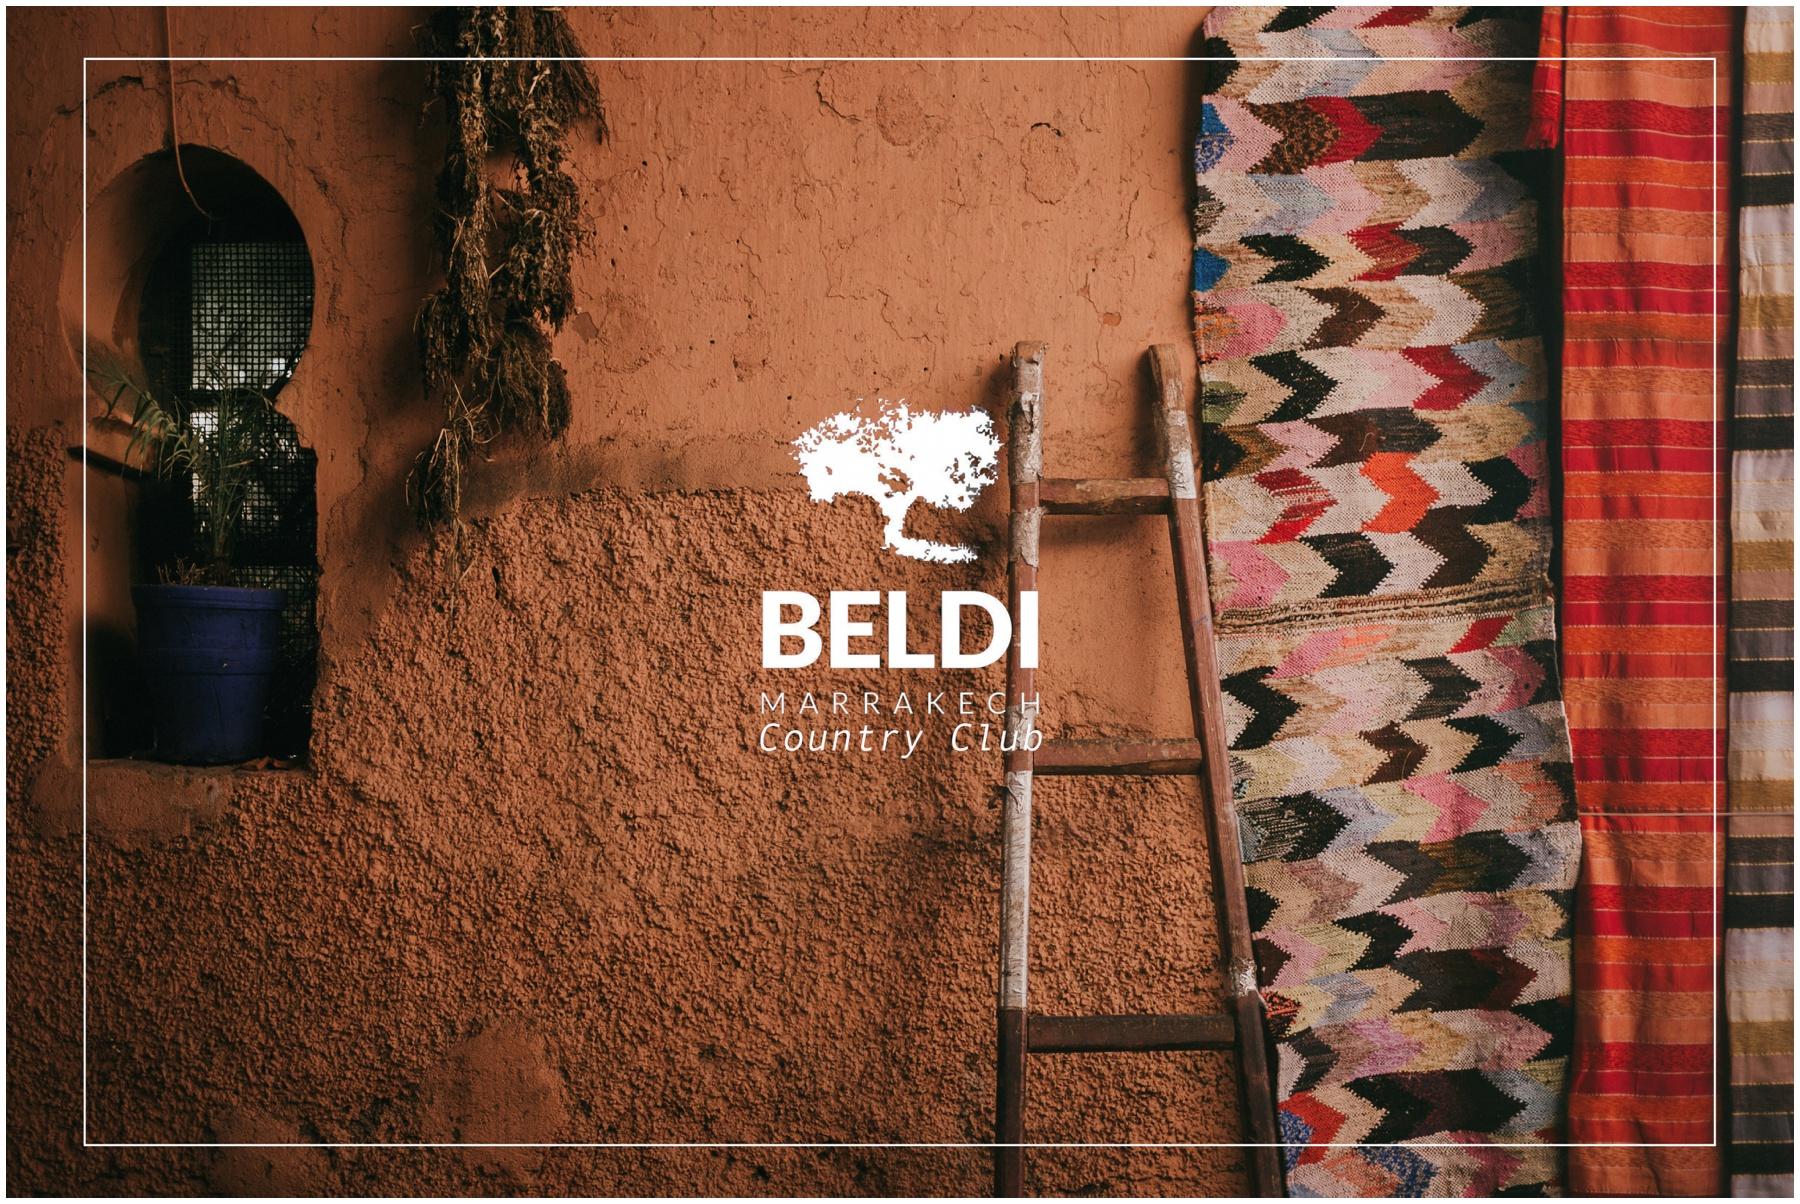 Beldi-country-club.jpg